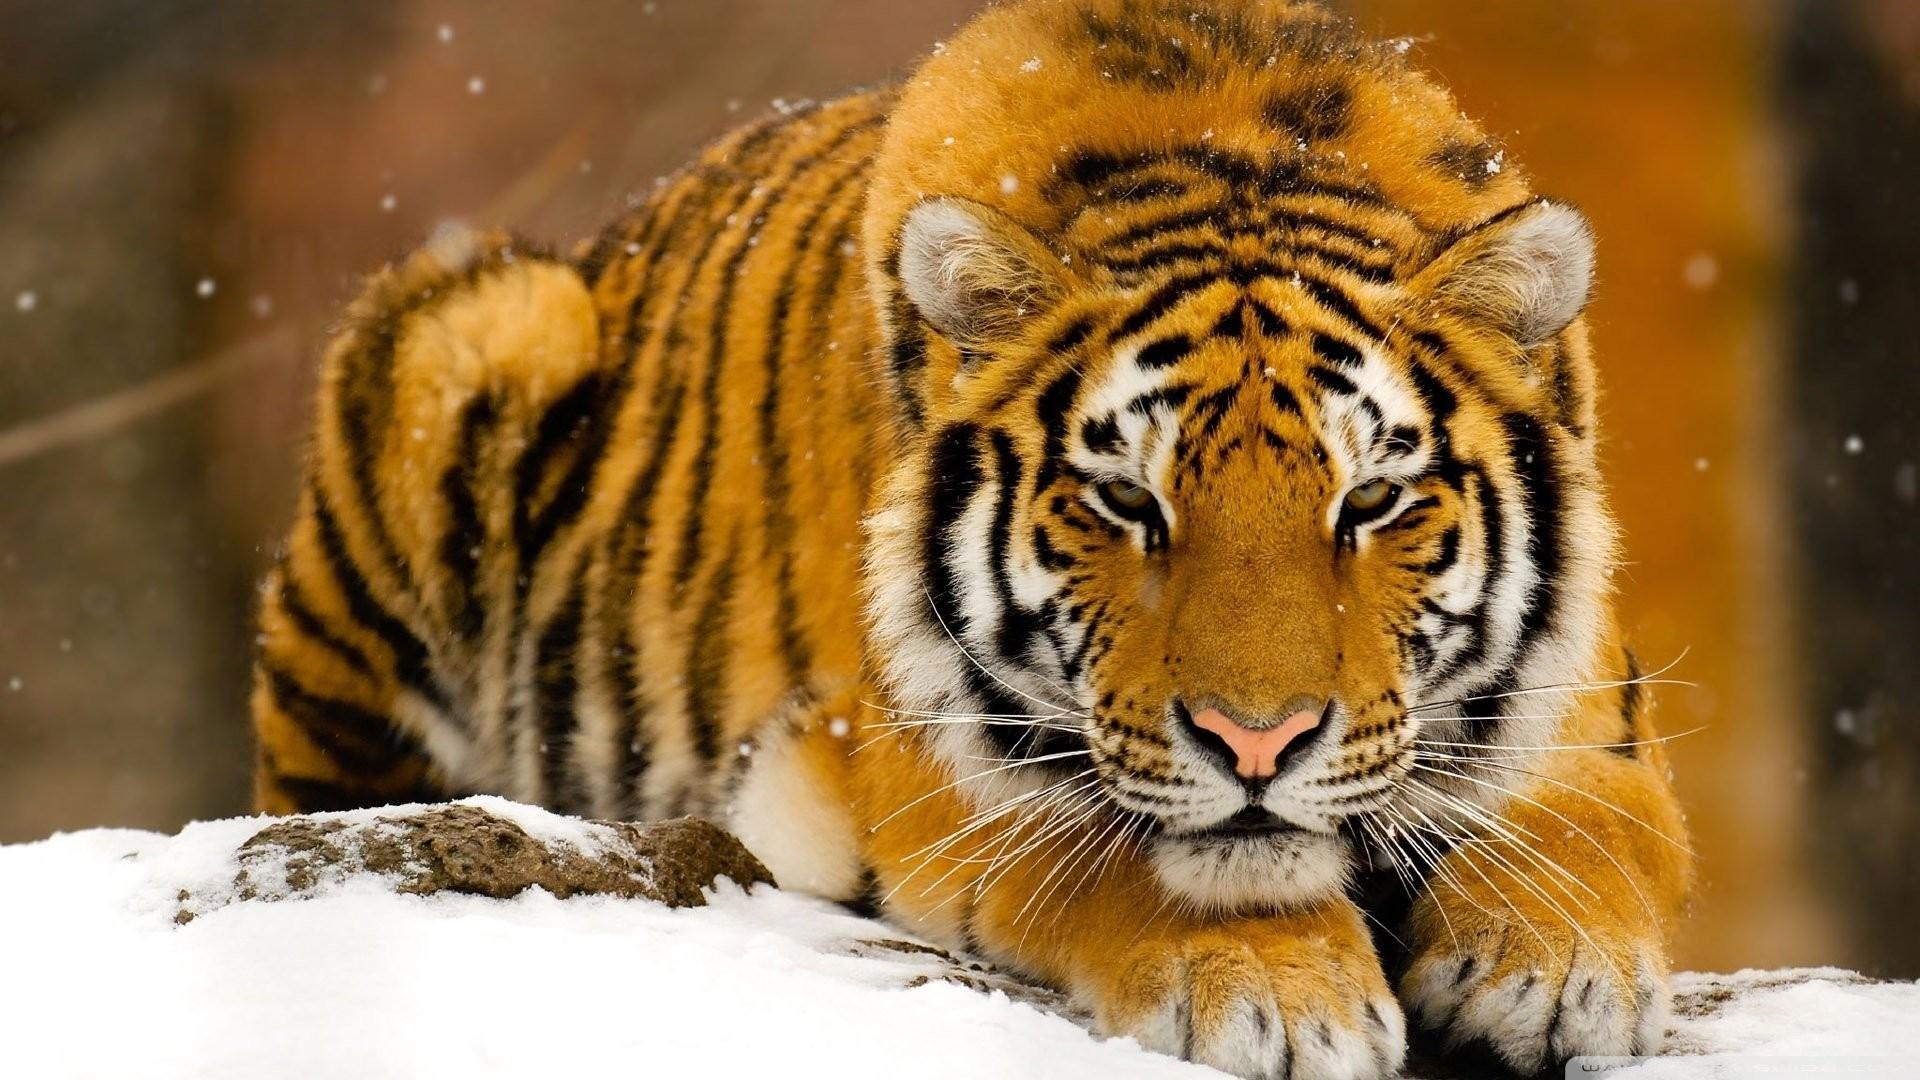 1920x1080 tiger wallpaper 1920x1080 for hd · Download · new tiger wallpaper 1920x1080 ...